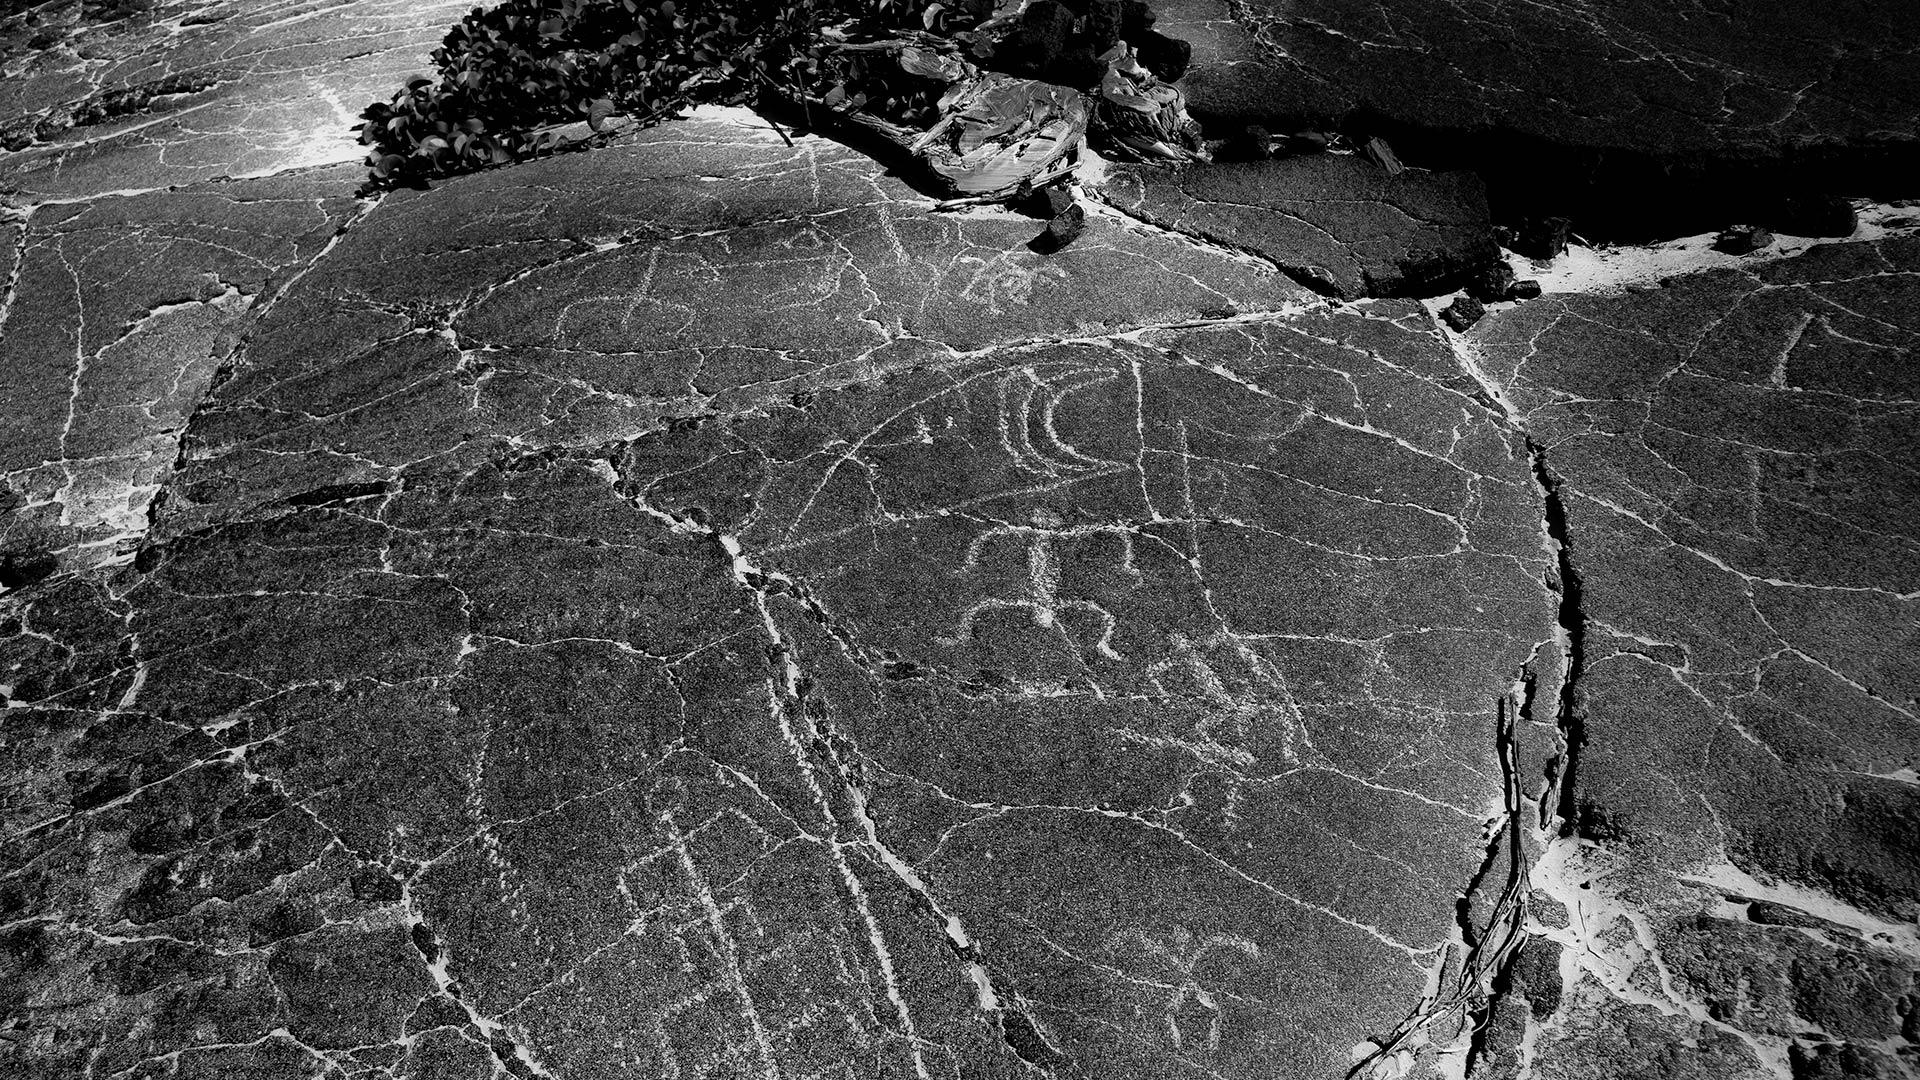 More than 3,000 ancient kii pohaku (petroglyphs) are preserved at nearby Puako